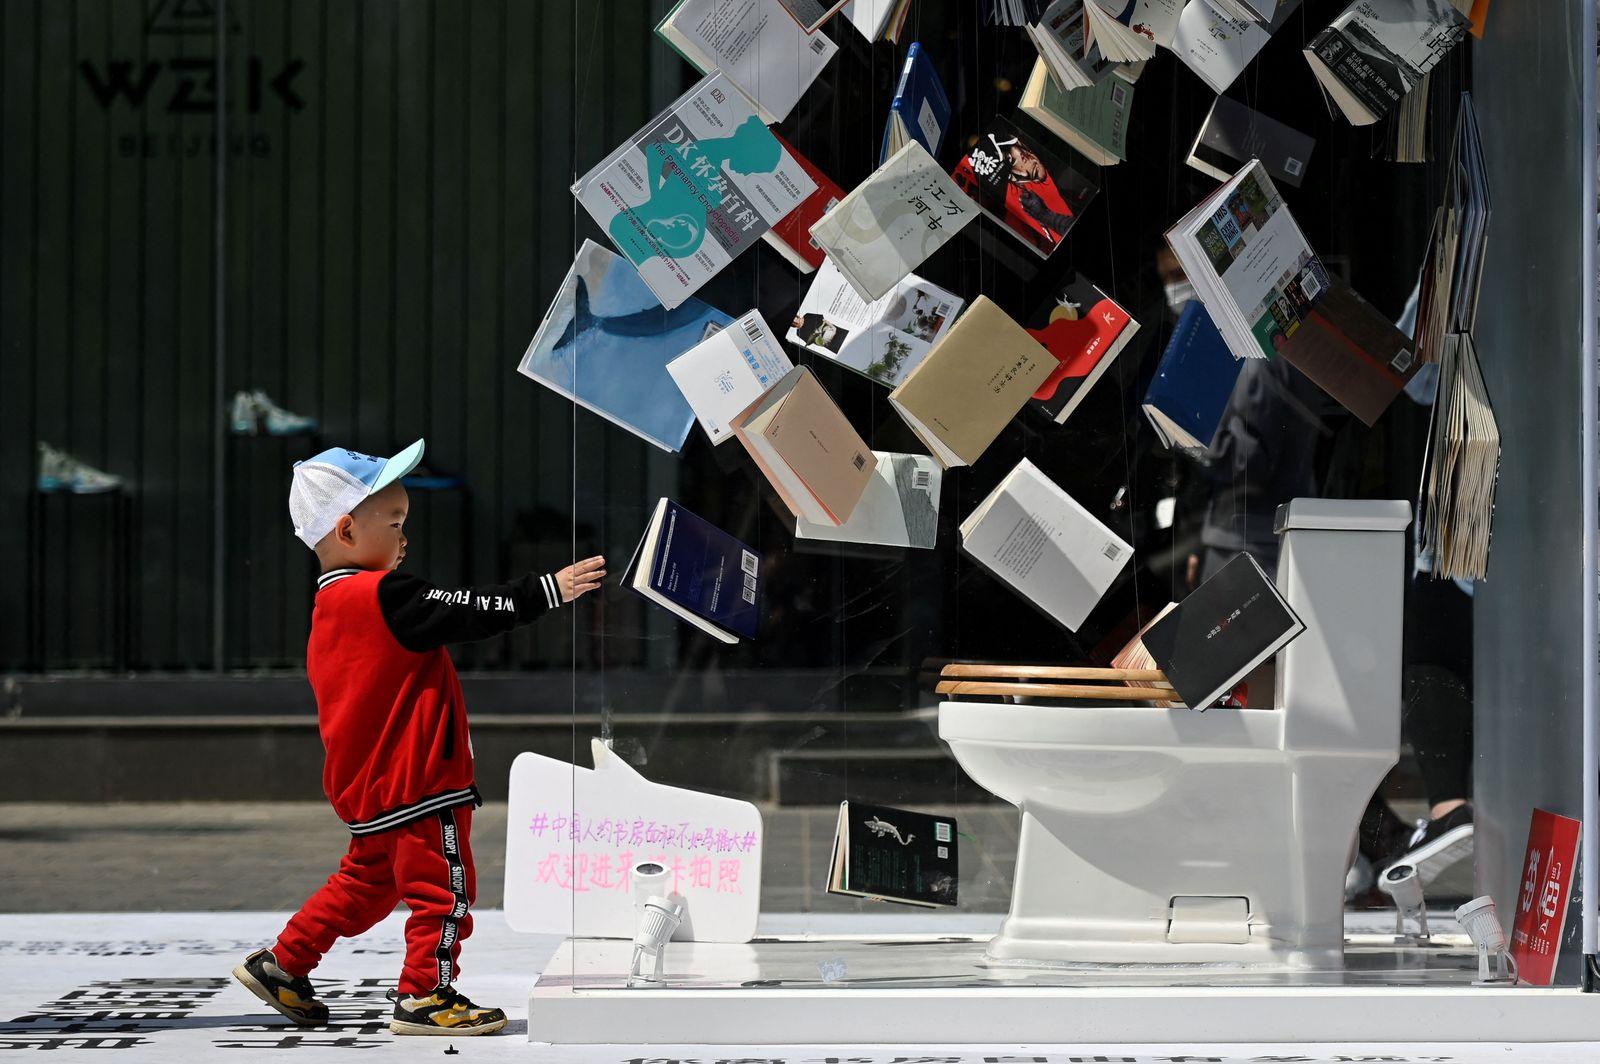 TOPSHOT-CHINA-LIFESTYLE-BOOK DAY